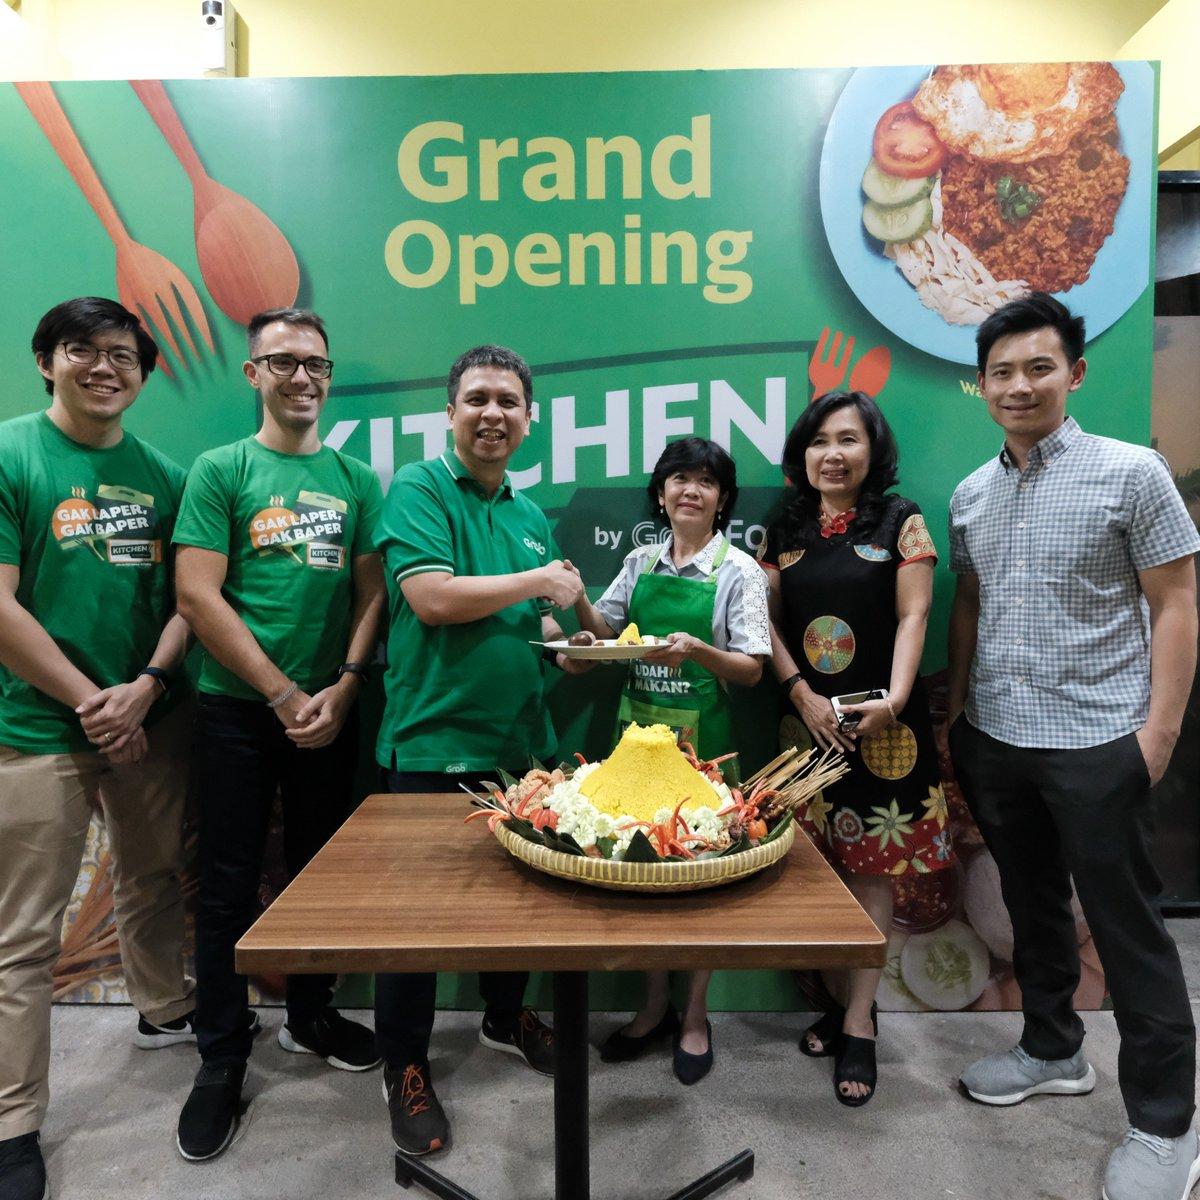 Grab punya kabar baik untukmu kamis 20 september 2018 kemarin grab resmi meluncurkan kitchen by grabfood https t co 2dhojwa5zg